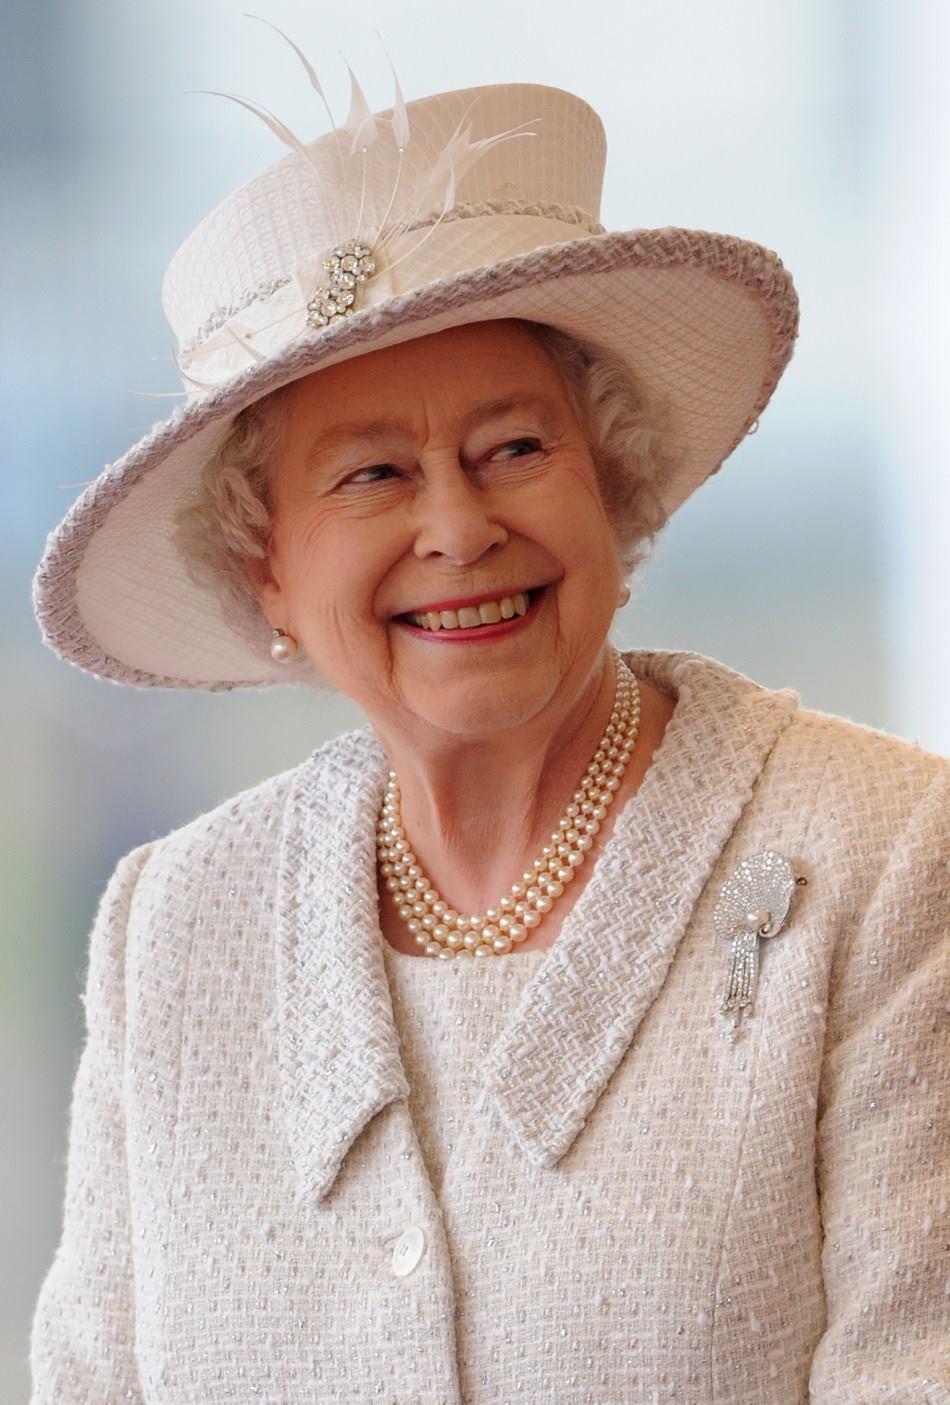 Queen Elizabeth II | Communio